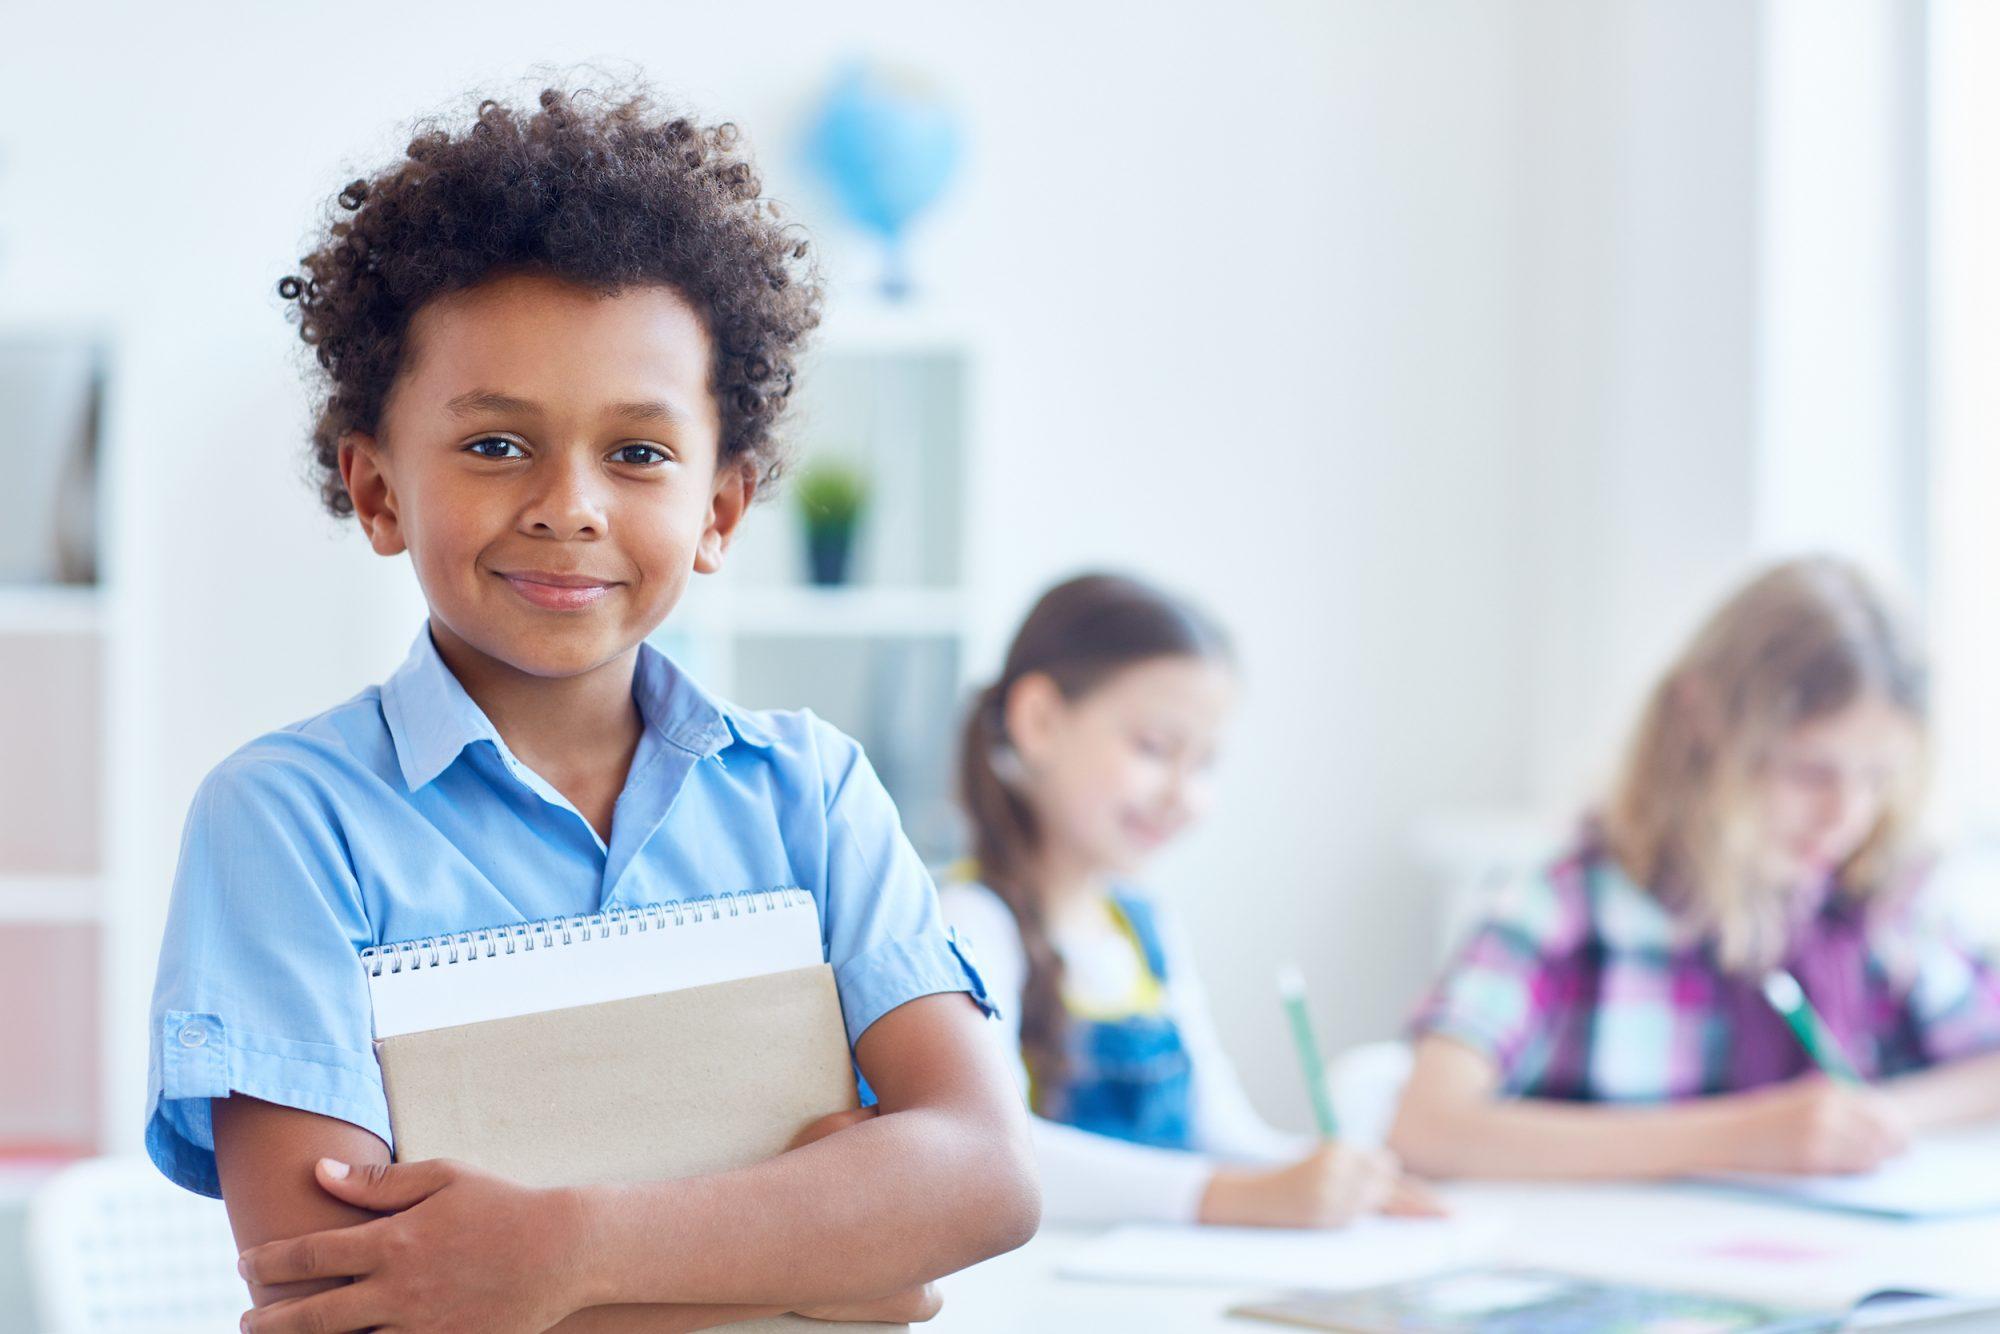 MoEHE Launches World Book Day Activities in Schools